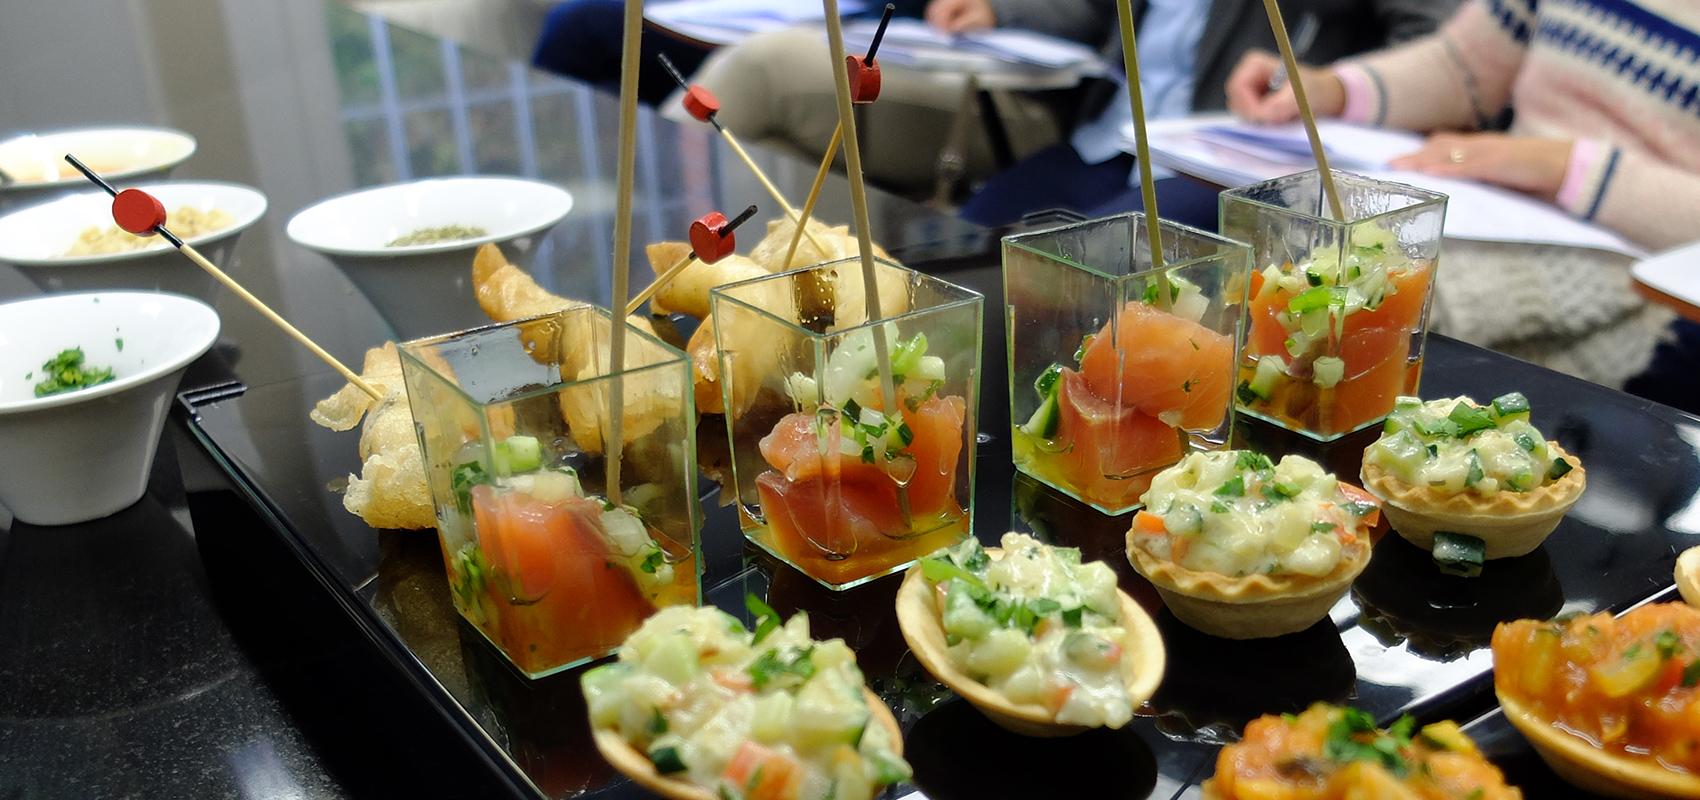 Cursos De Cocina En Pamplona | Cursos Cocina Pamplona Arquitectura Del Hogar Serart Net